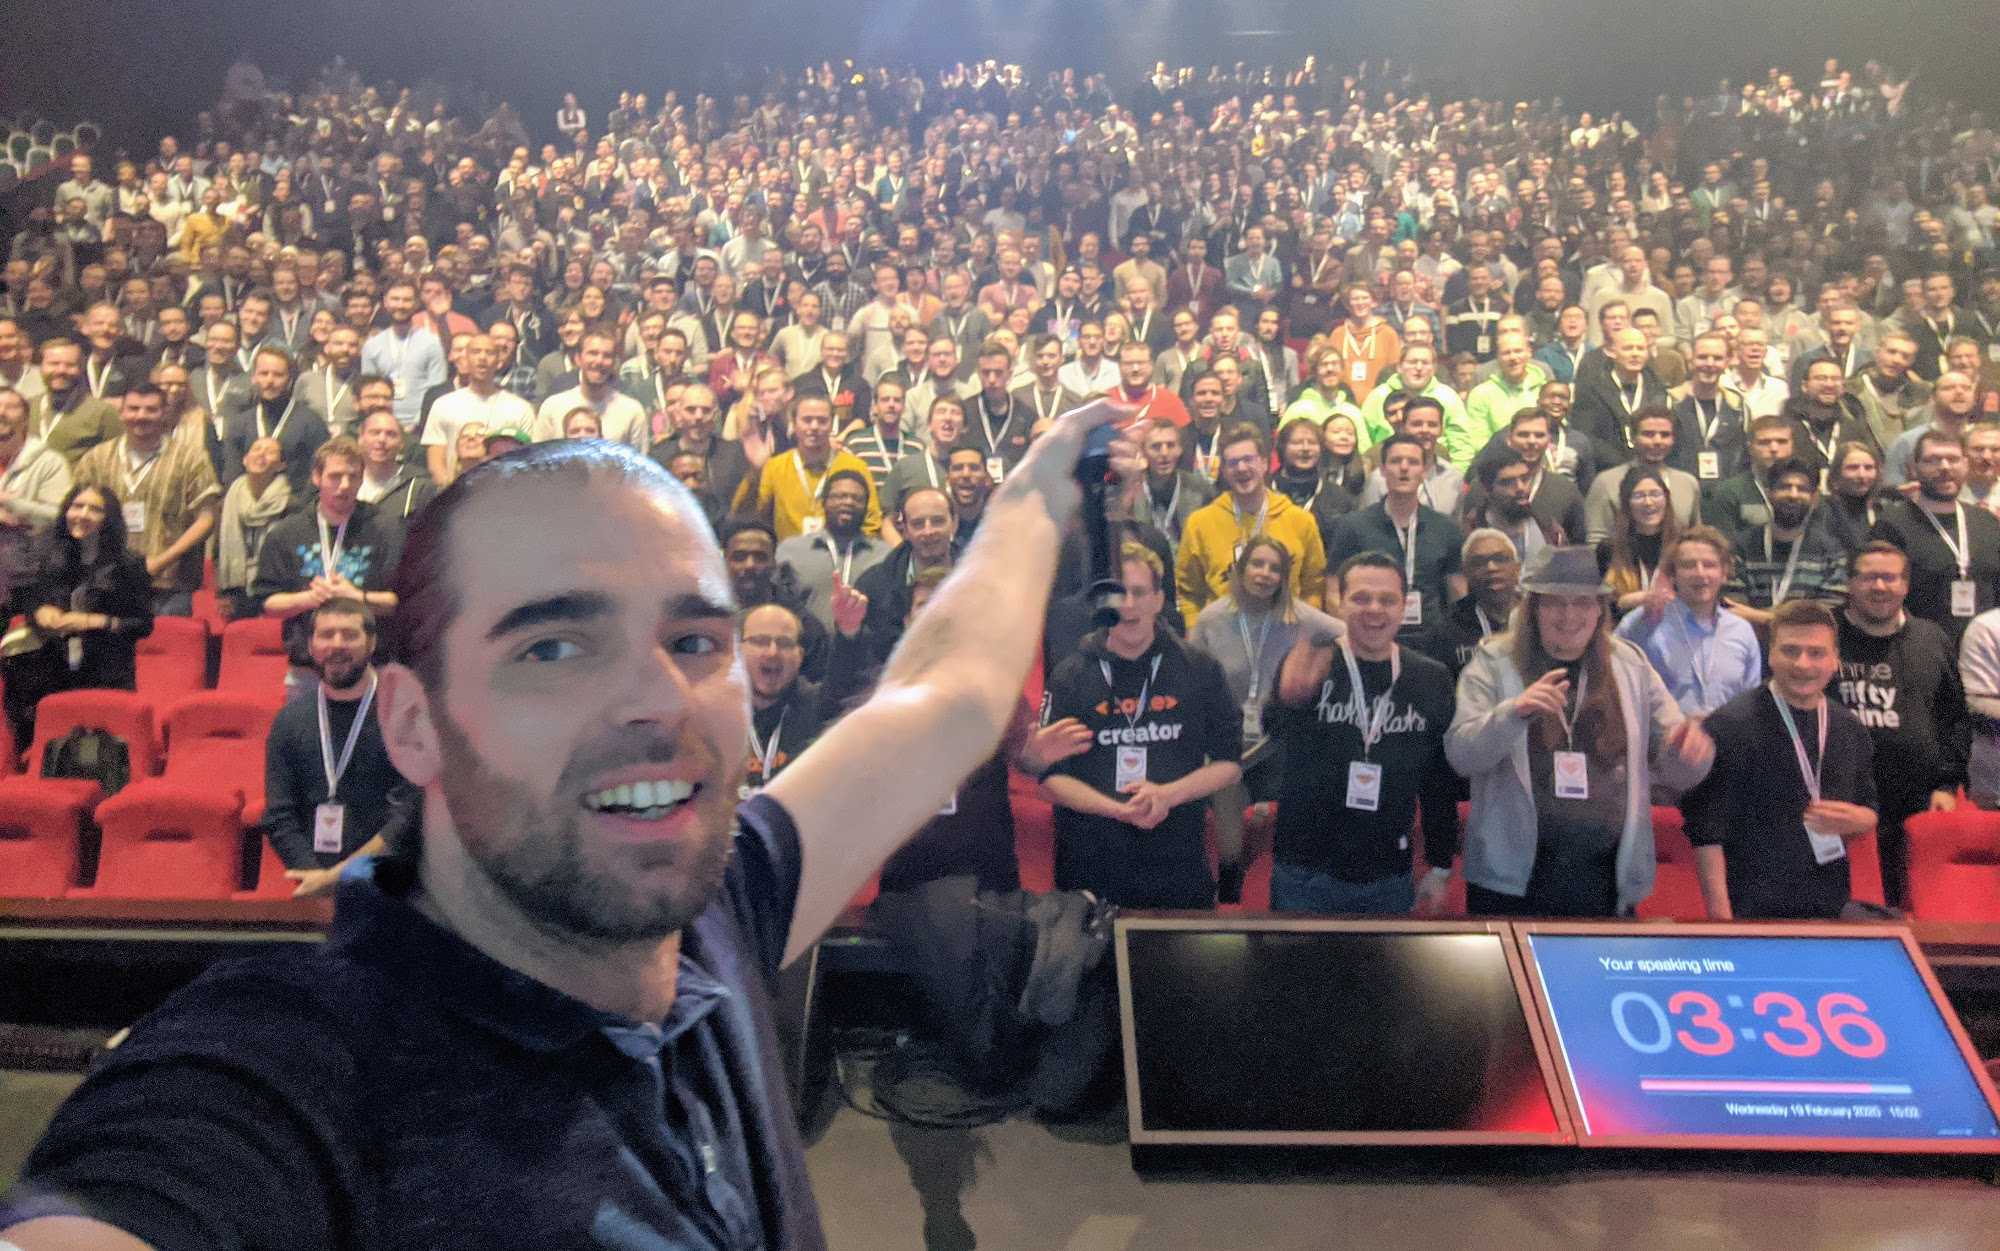 Speaking at Frontend Developer Love